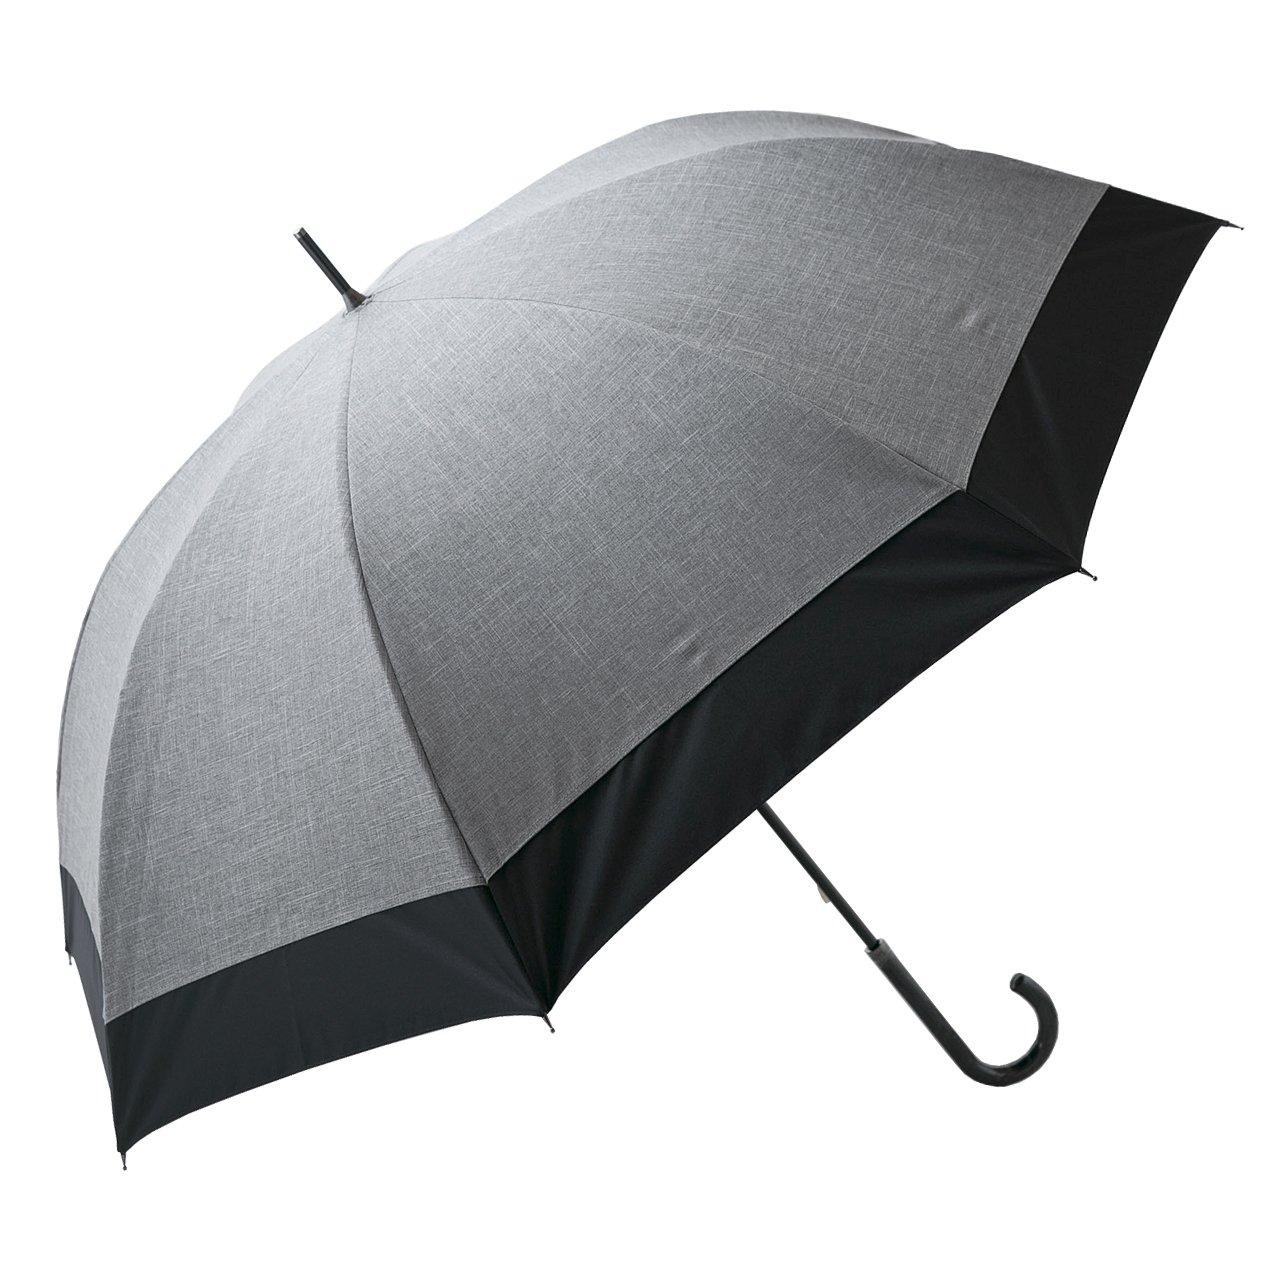 【Rose Blanc】100%完全遮光 日傘 コンビ 男女兼用 メンズサイズ ダンガリー 65cm (ダンガリーグレー×ブラック) B01F1SKKZKダンガリーグレー×ブラック